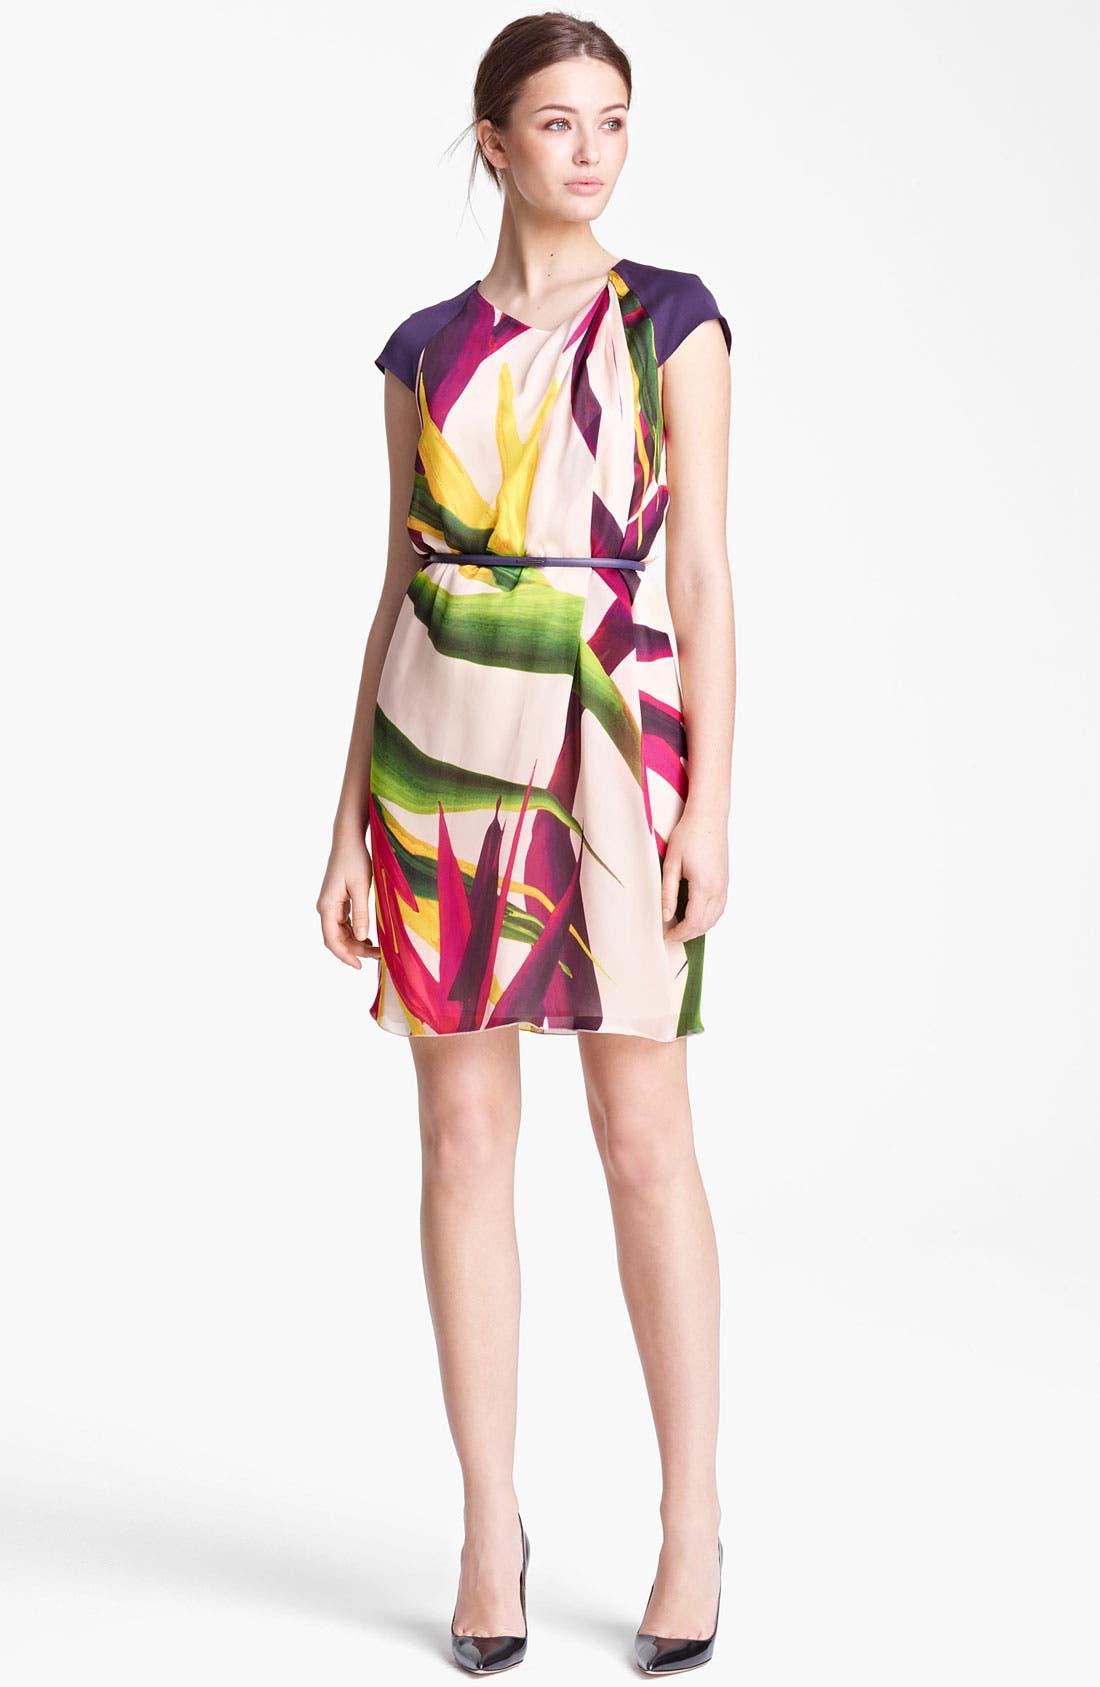 Alternate Image 1 Selected - Max Mara 'Harry' Floral Print Silk Dress